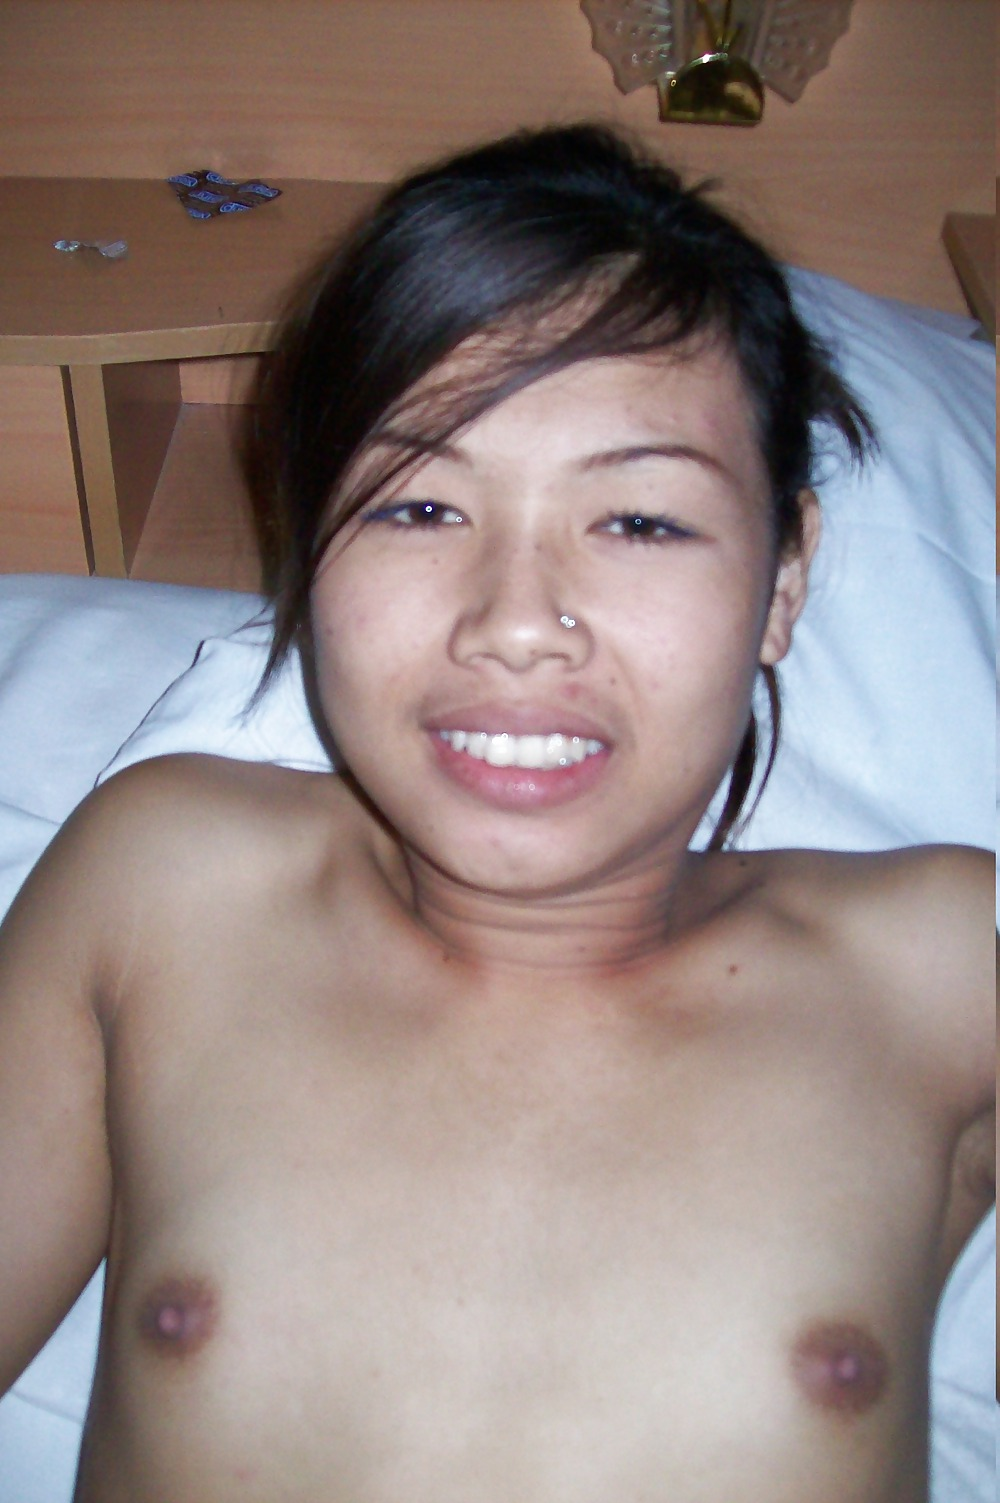 Big dick shemales nude pics